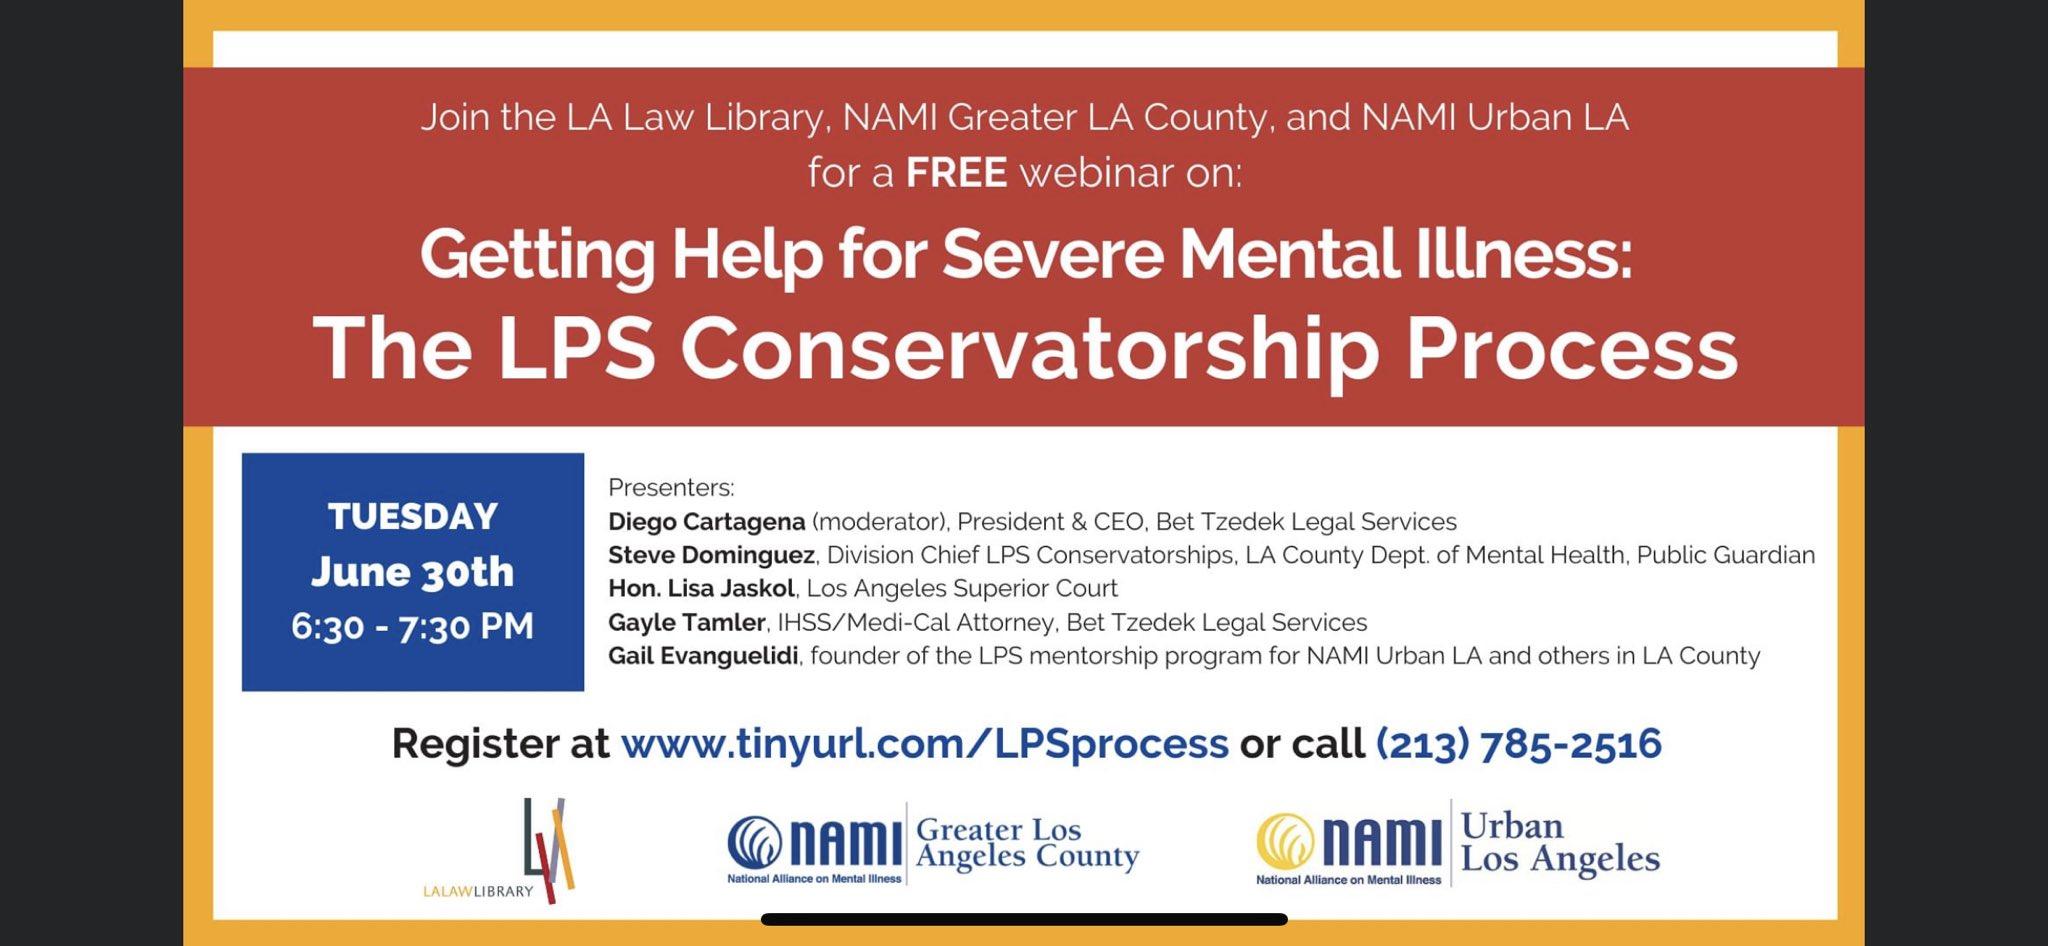 LPS Conservatorship Webinar